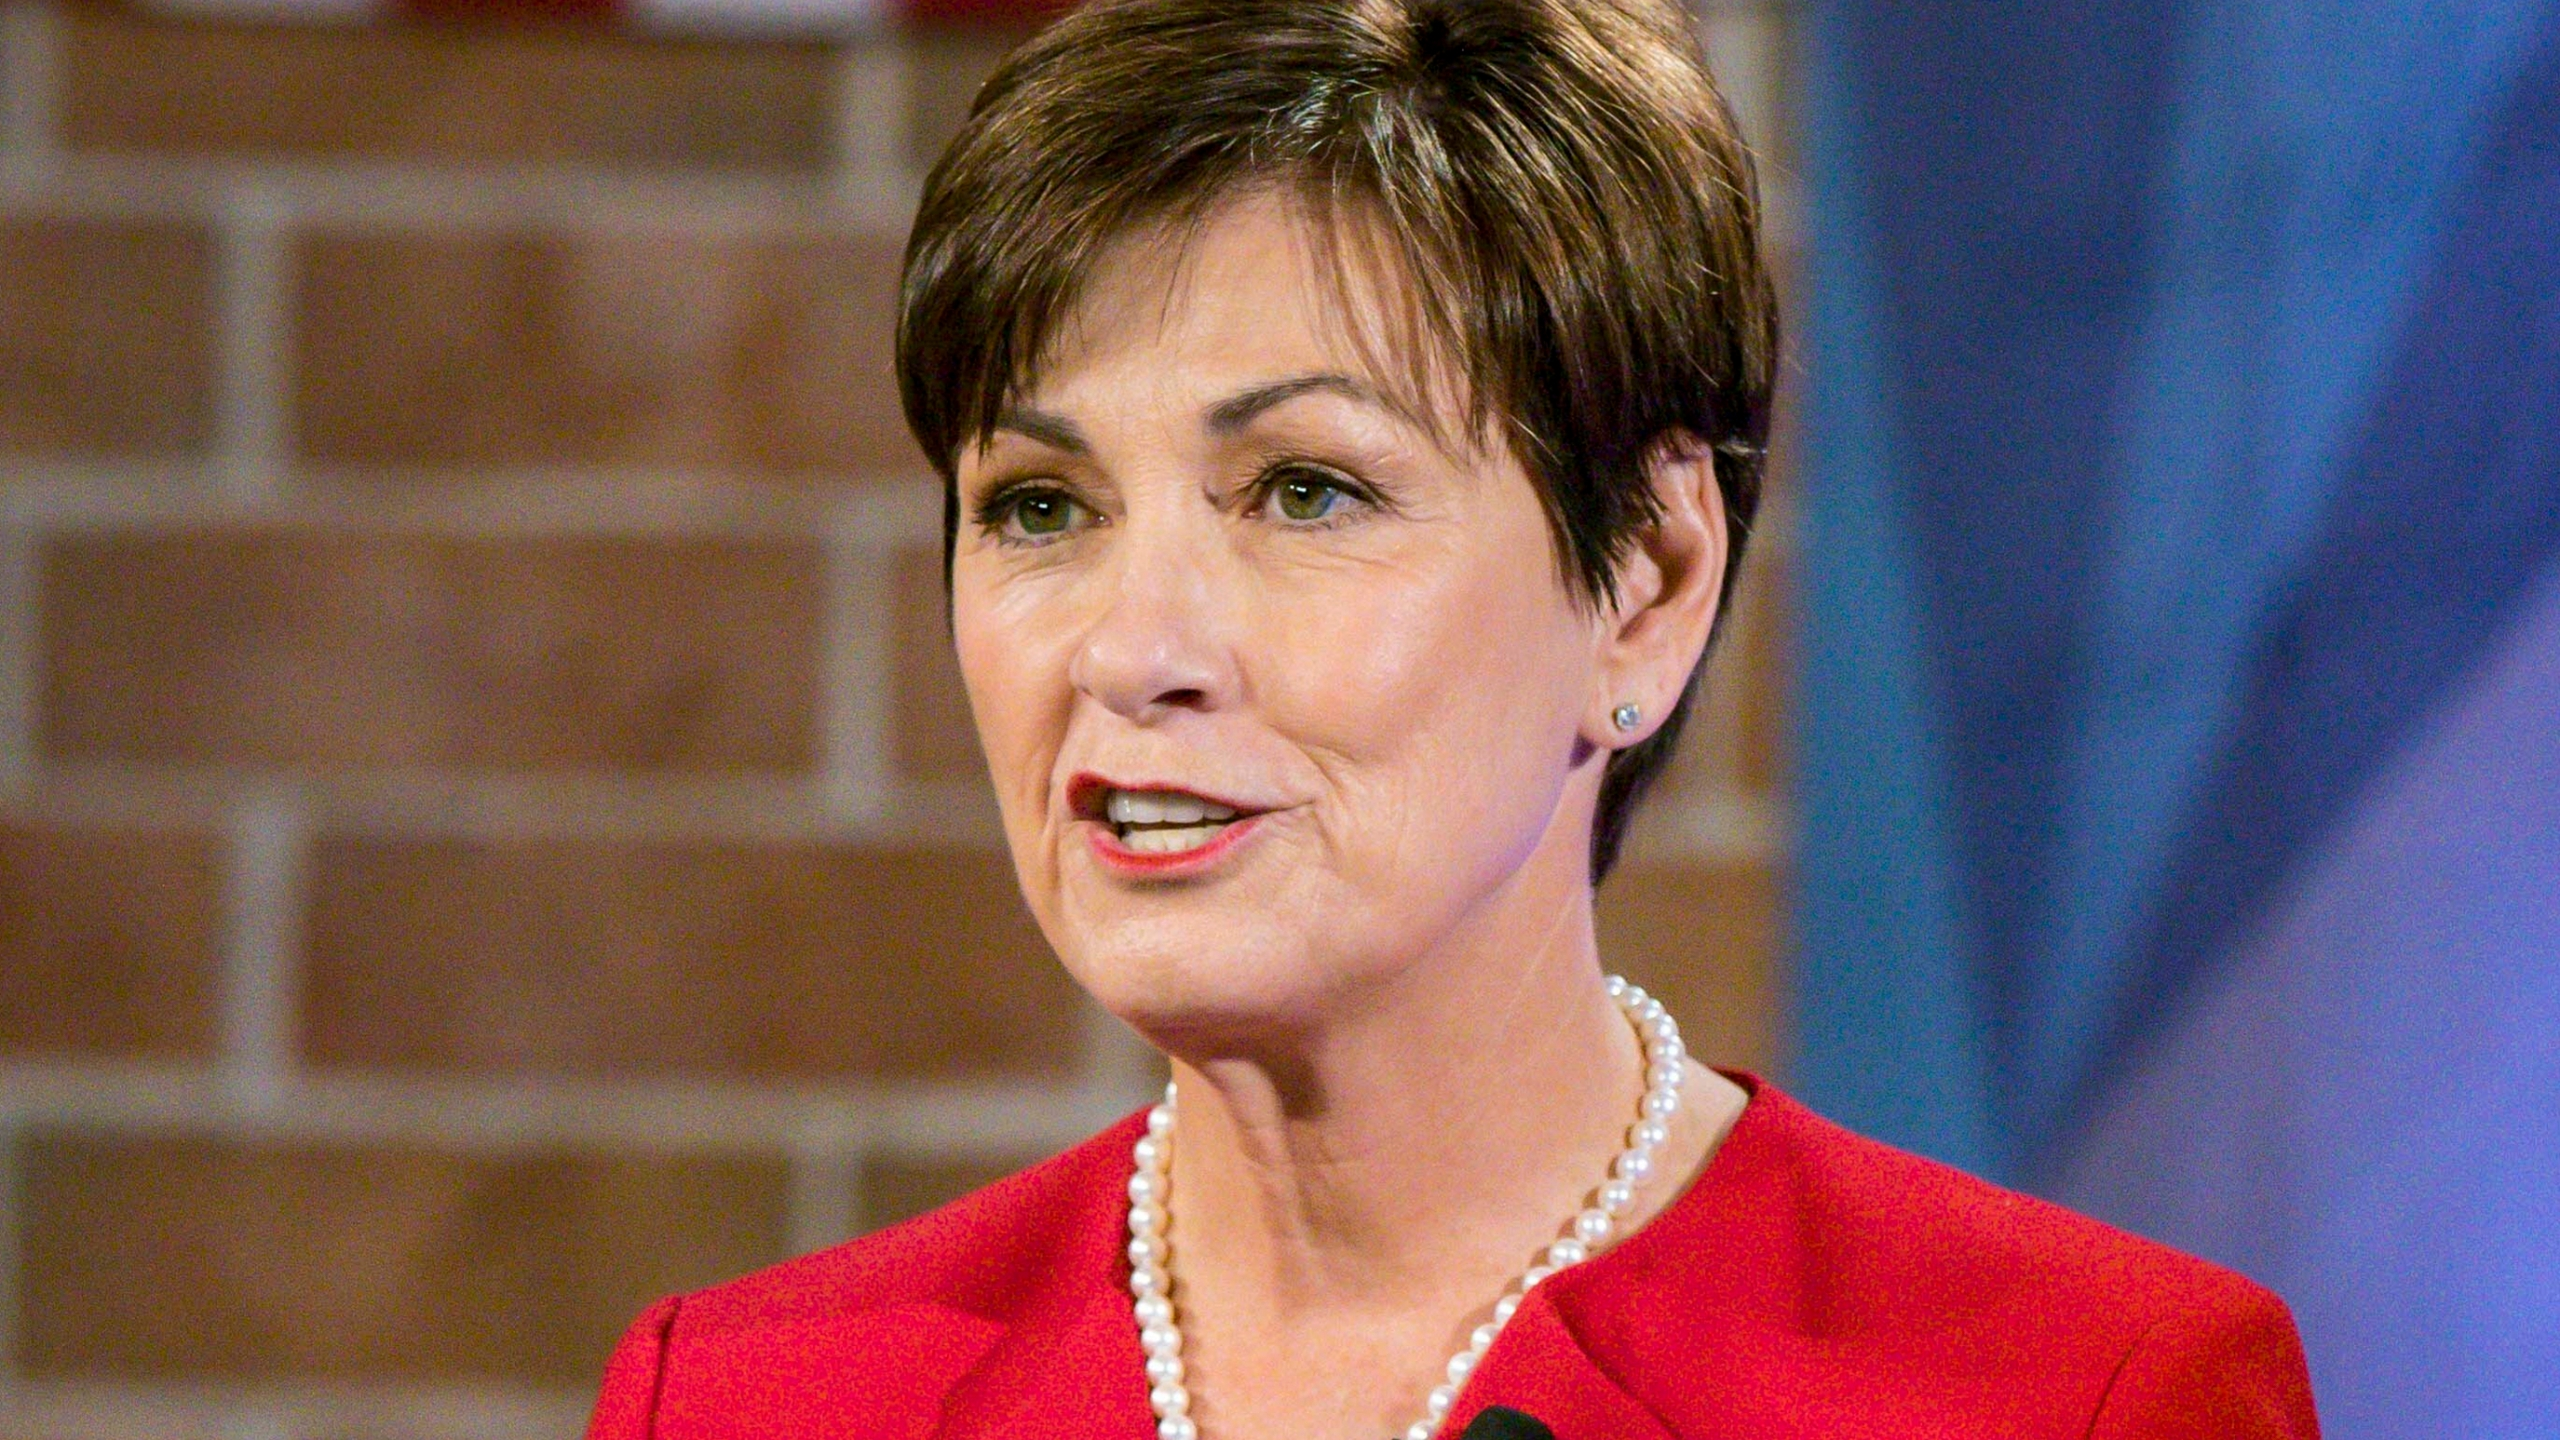 Election_2018_Governor_Iowa_Reynolds_37977-159532.jpg17224789